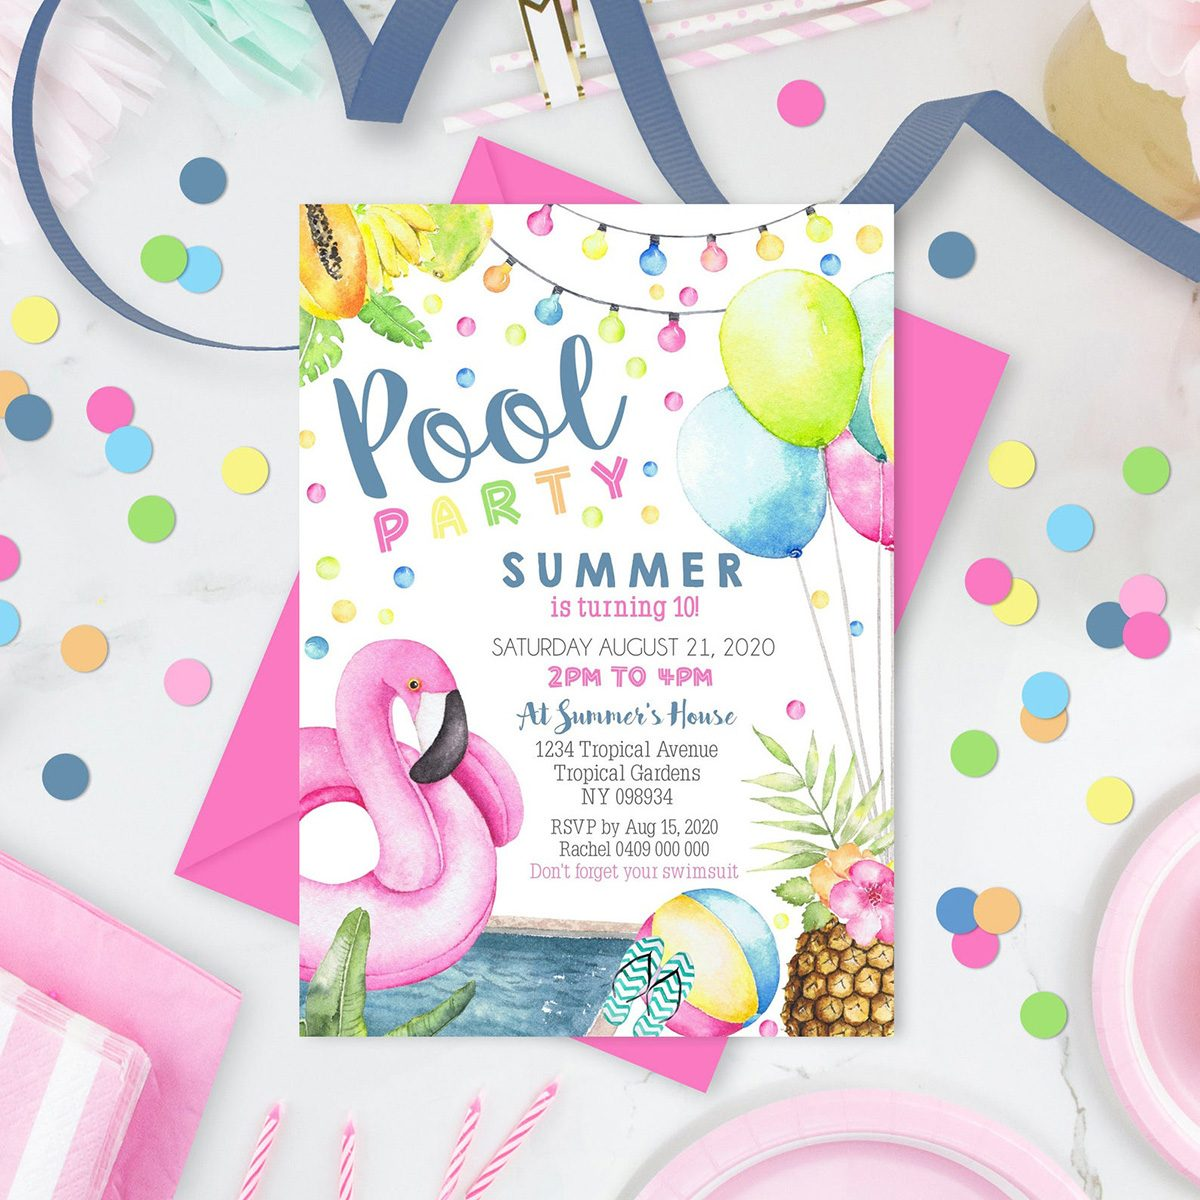 POOL PARTY Invitation Girl Pool Party Invitation Flamingo Pool Party Invitation Instant Download Pool Invitation Swim Party Girl Corjl 0274